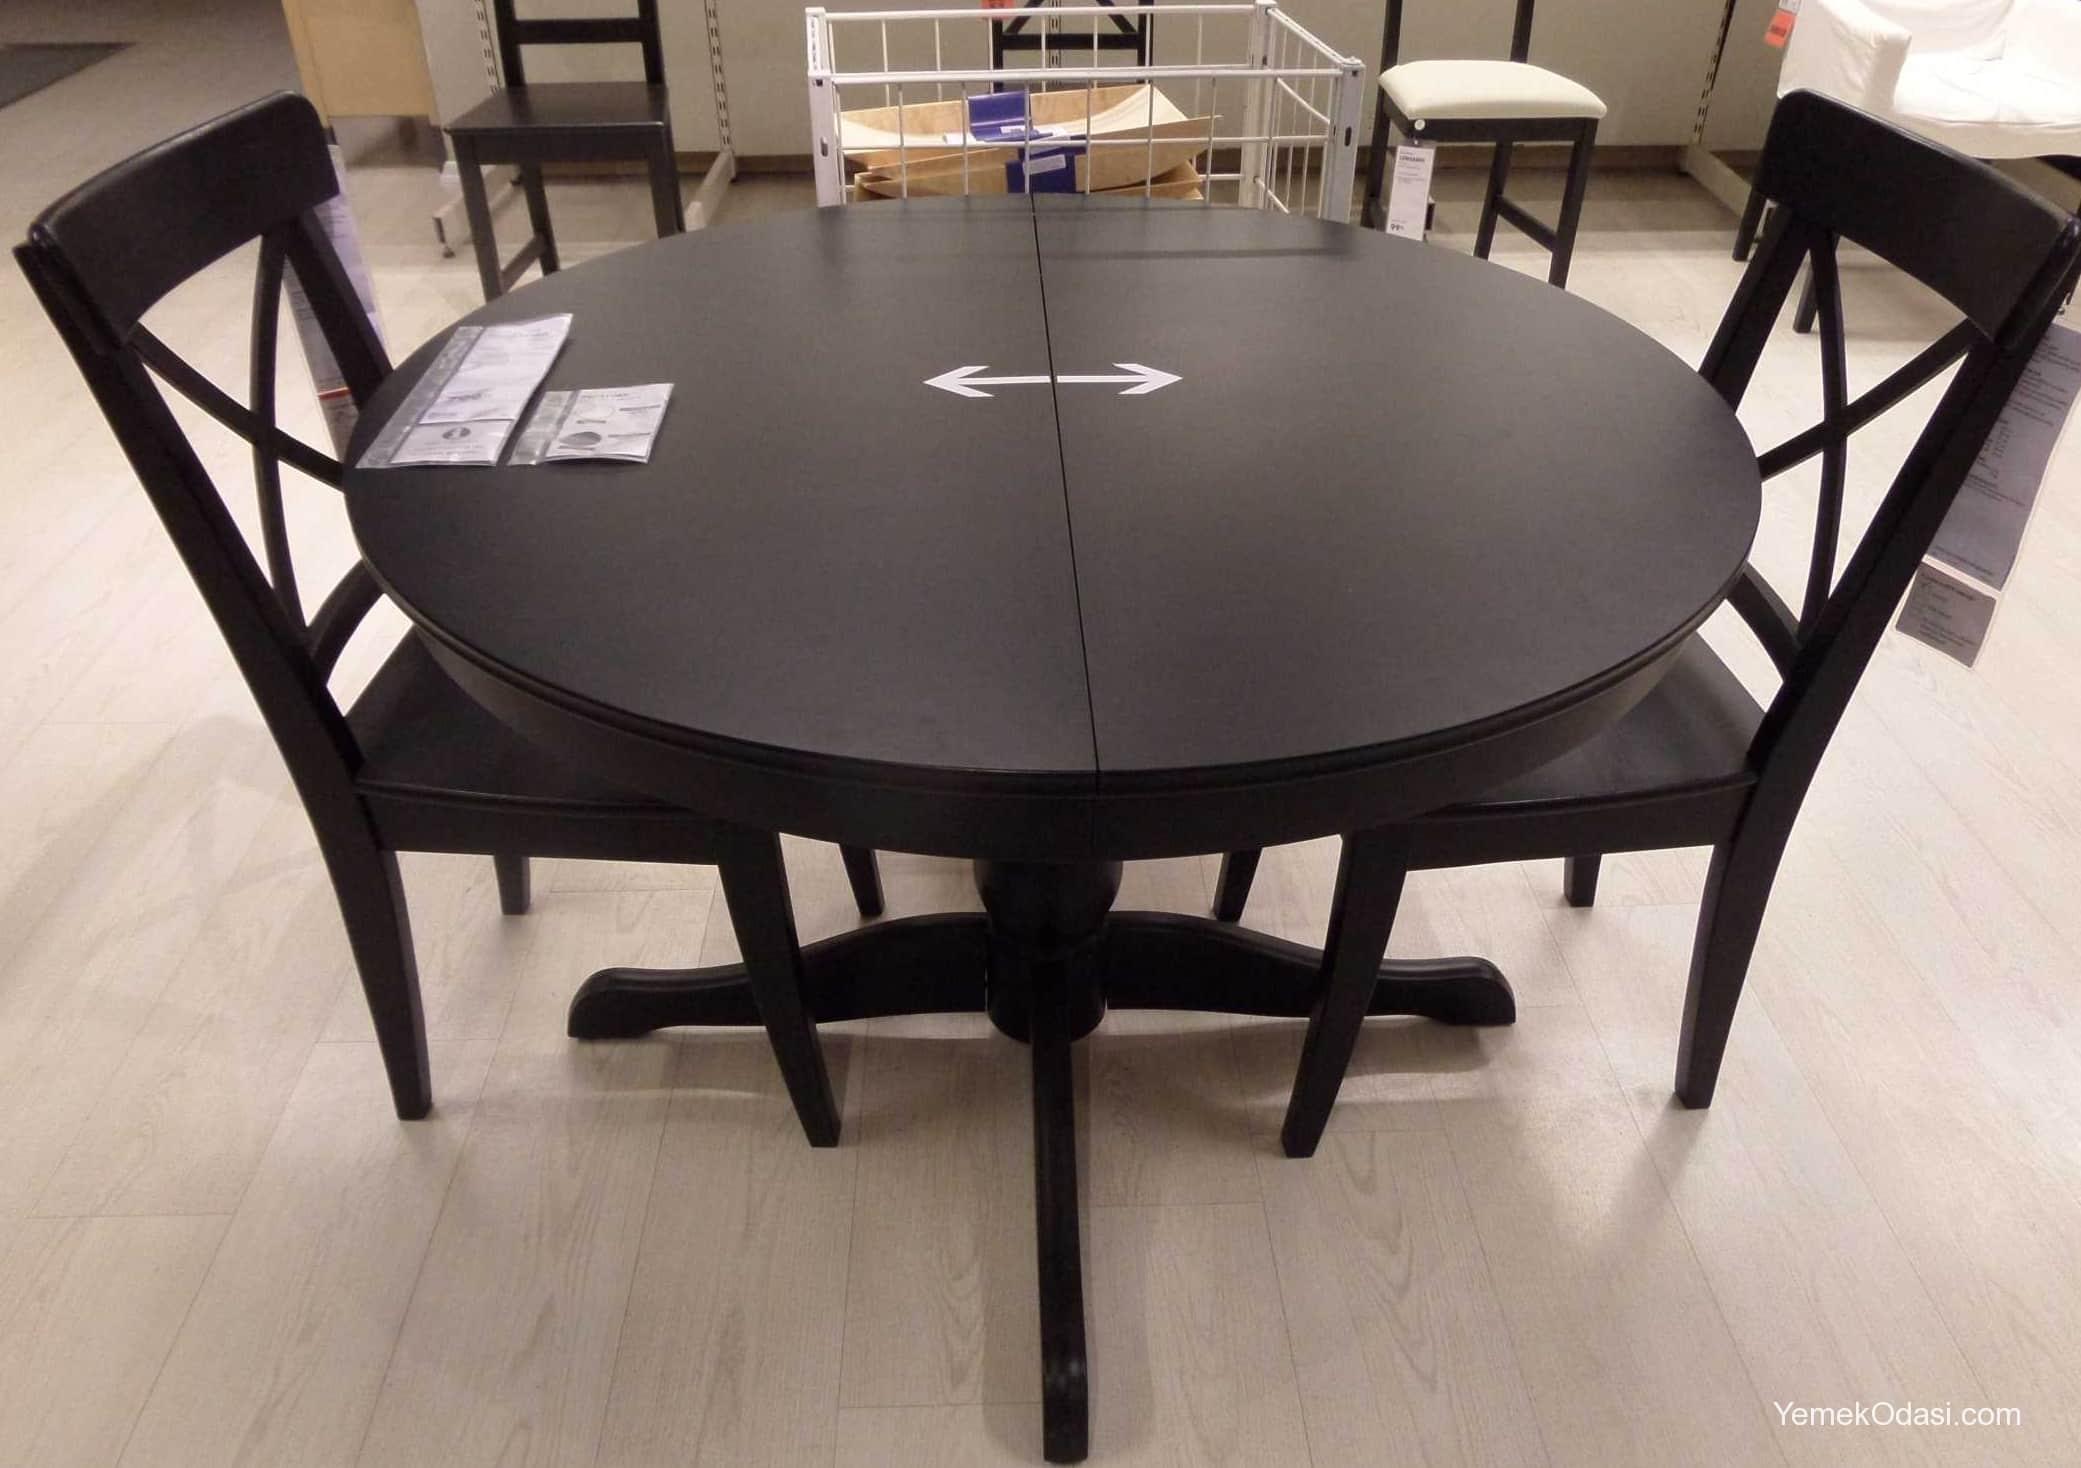 Yeni Ikea Yemek Masalari 2